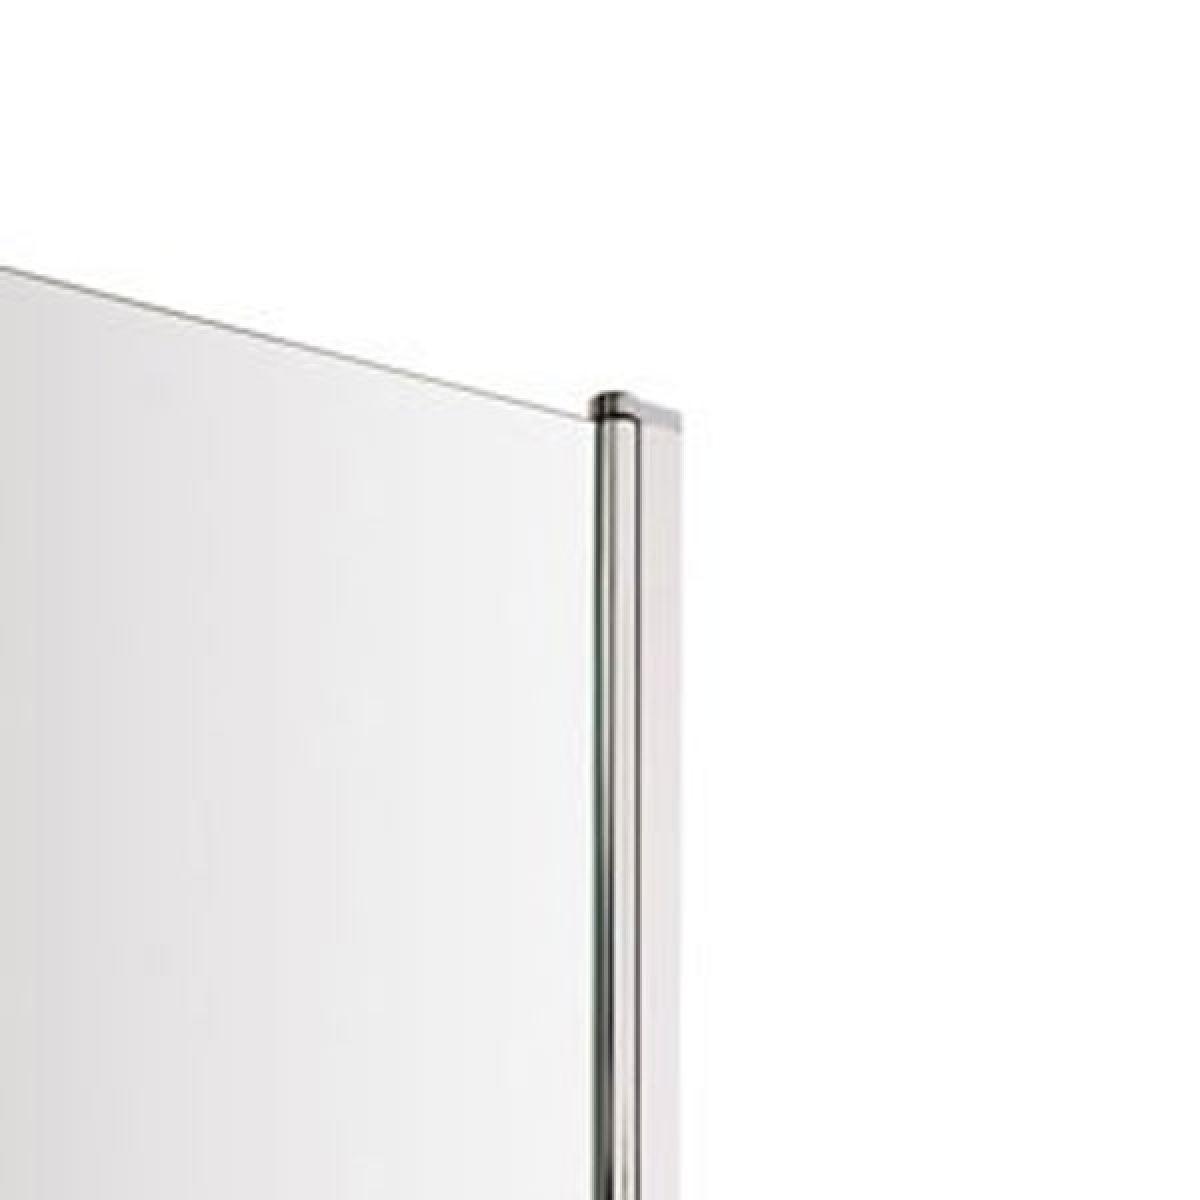 Premier Straight Square Edge Bath Screen with Rail